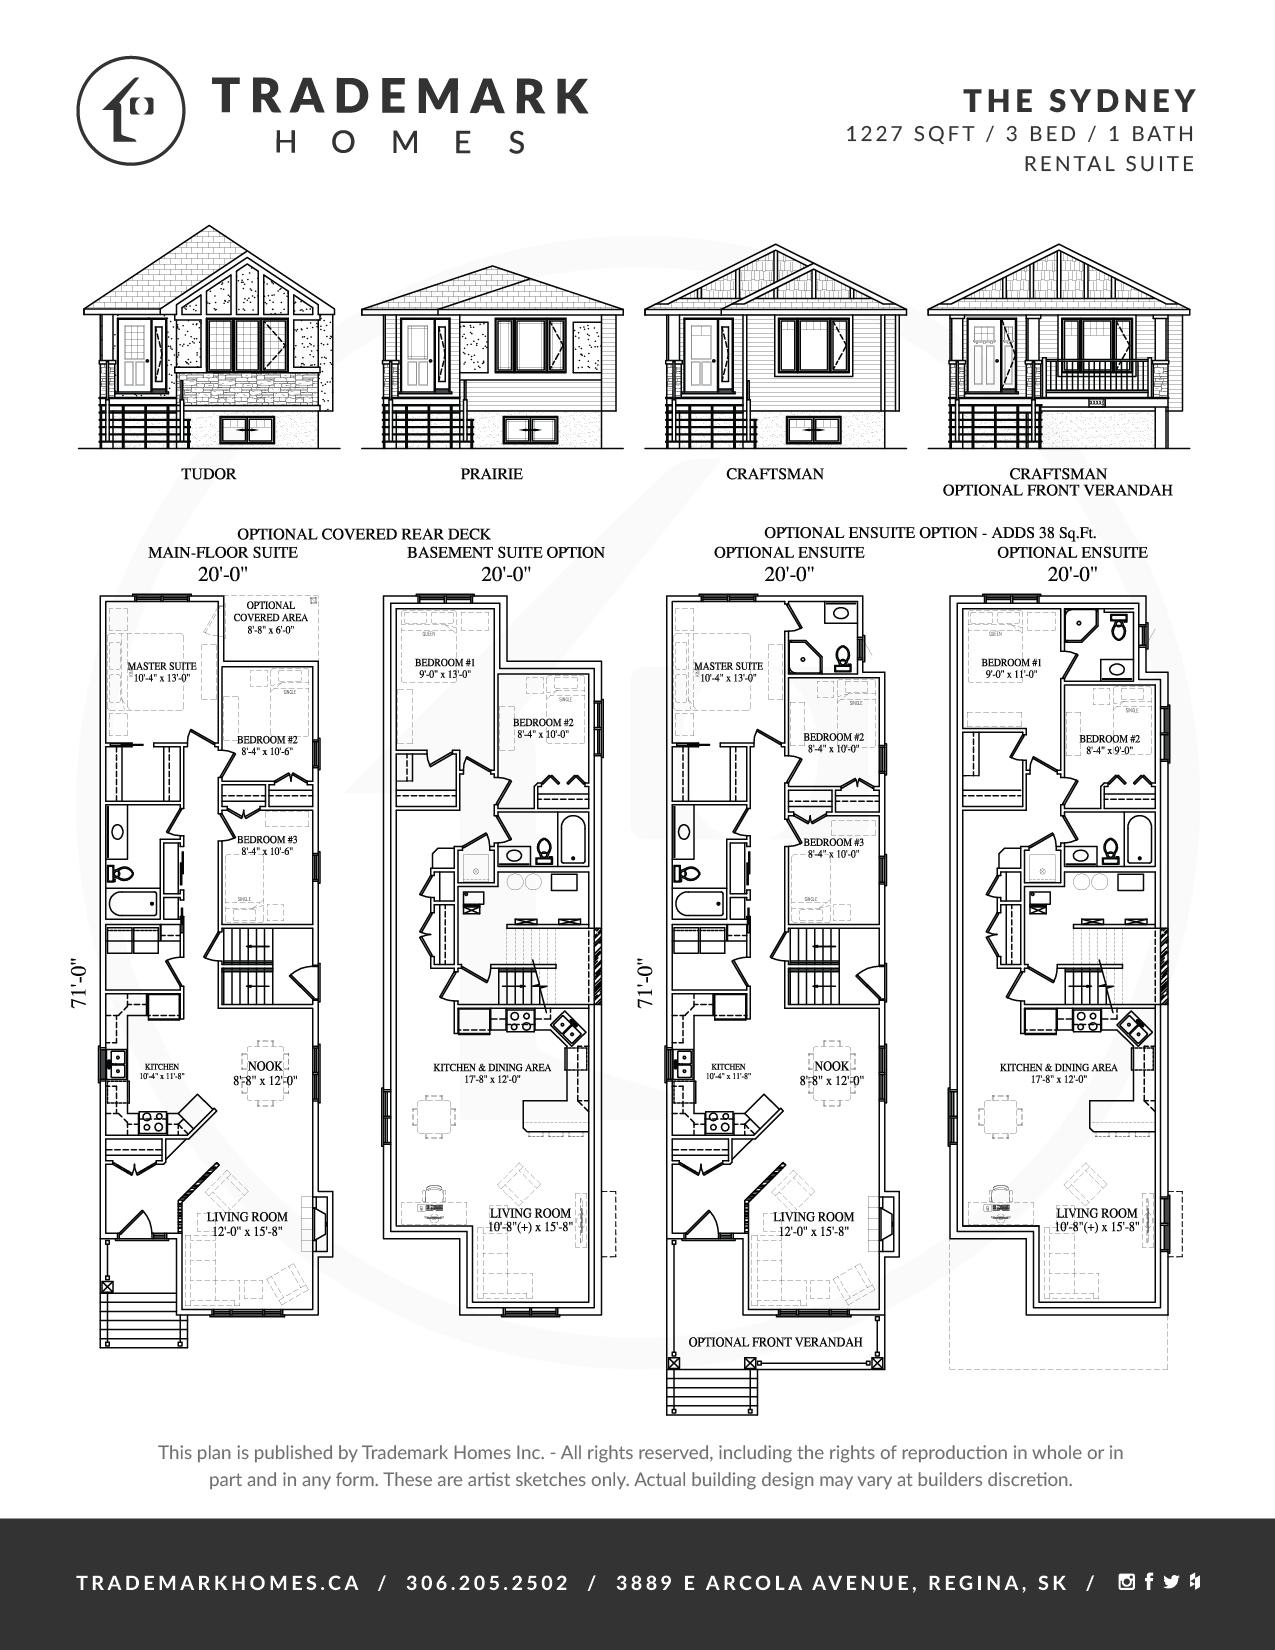 Trademark Homes The Sydney Lane Lot